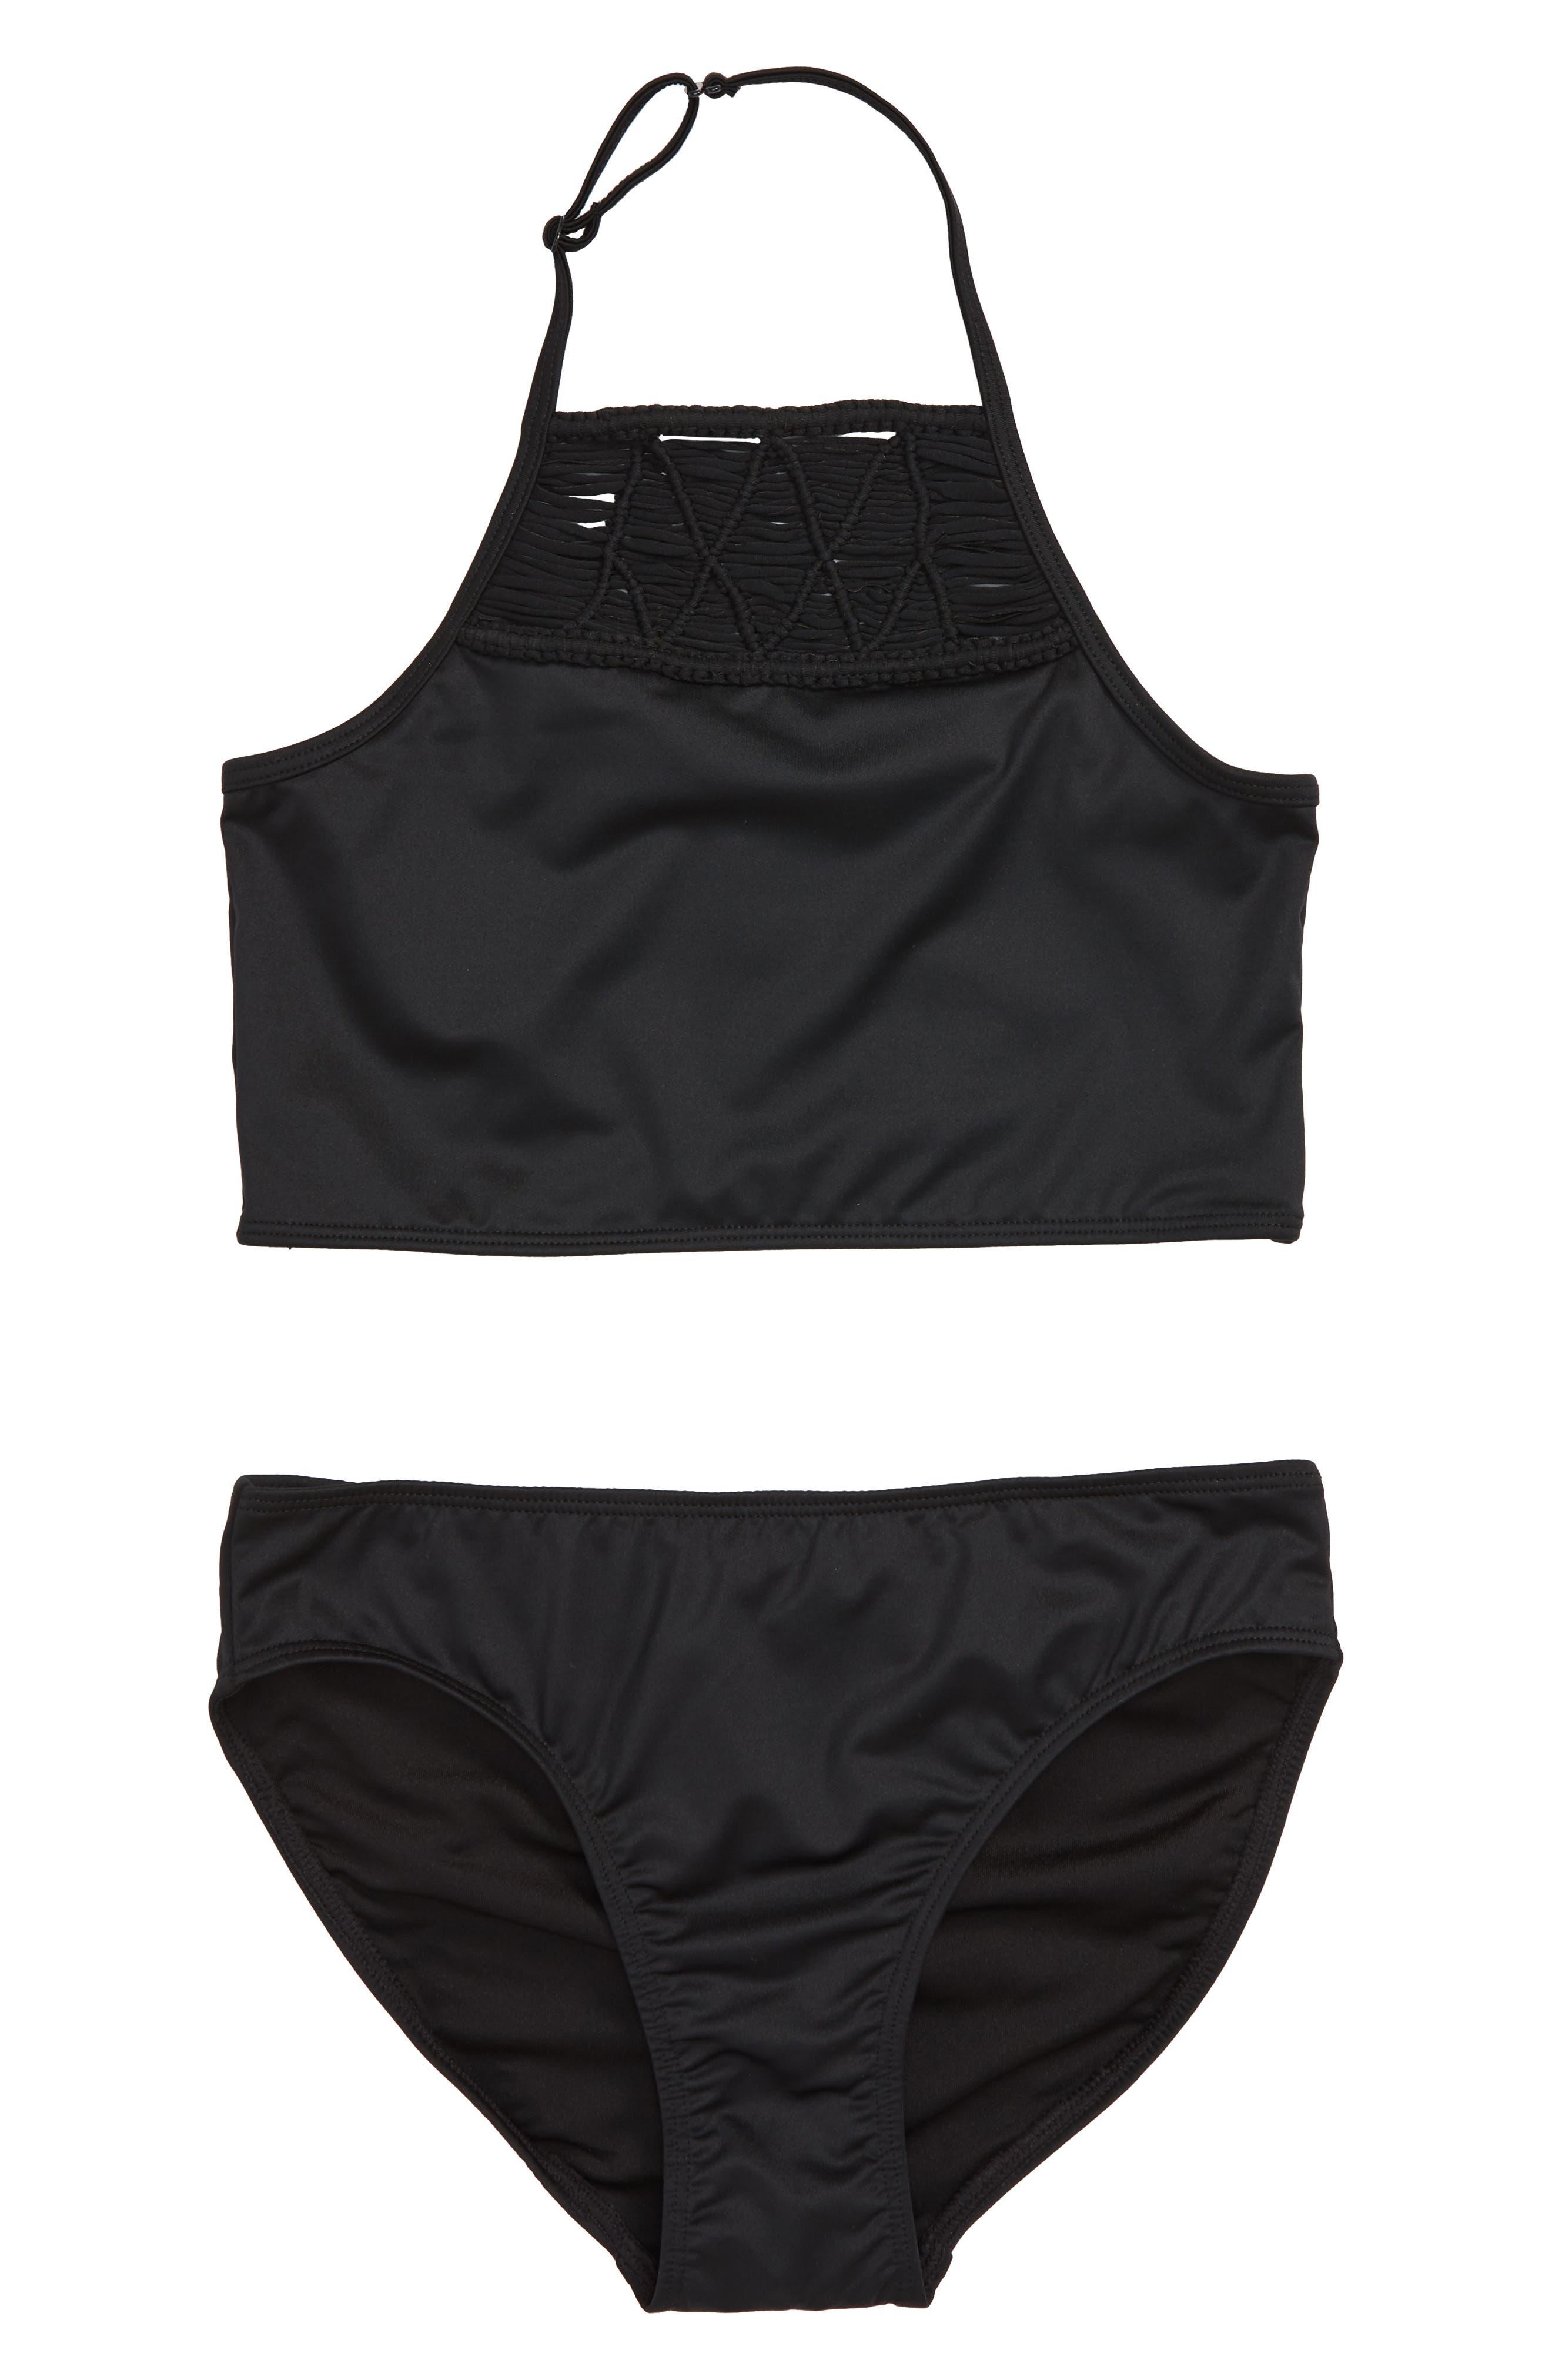 b8c62abf53 Tween Swimsuits & Swimwear Cover-Ups | Nordstrom